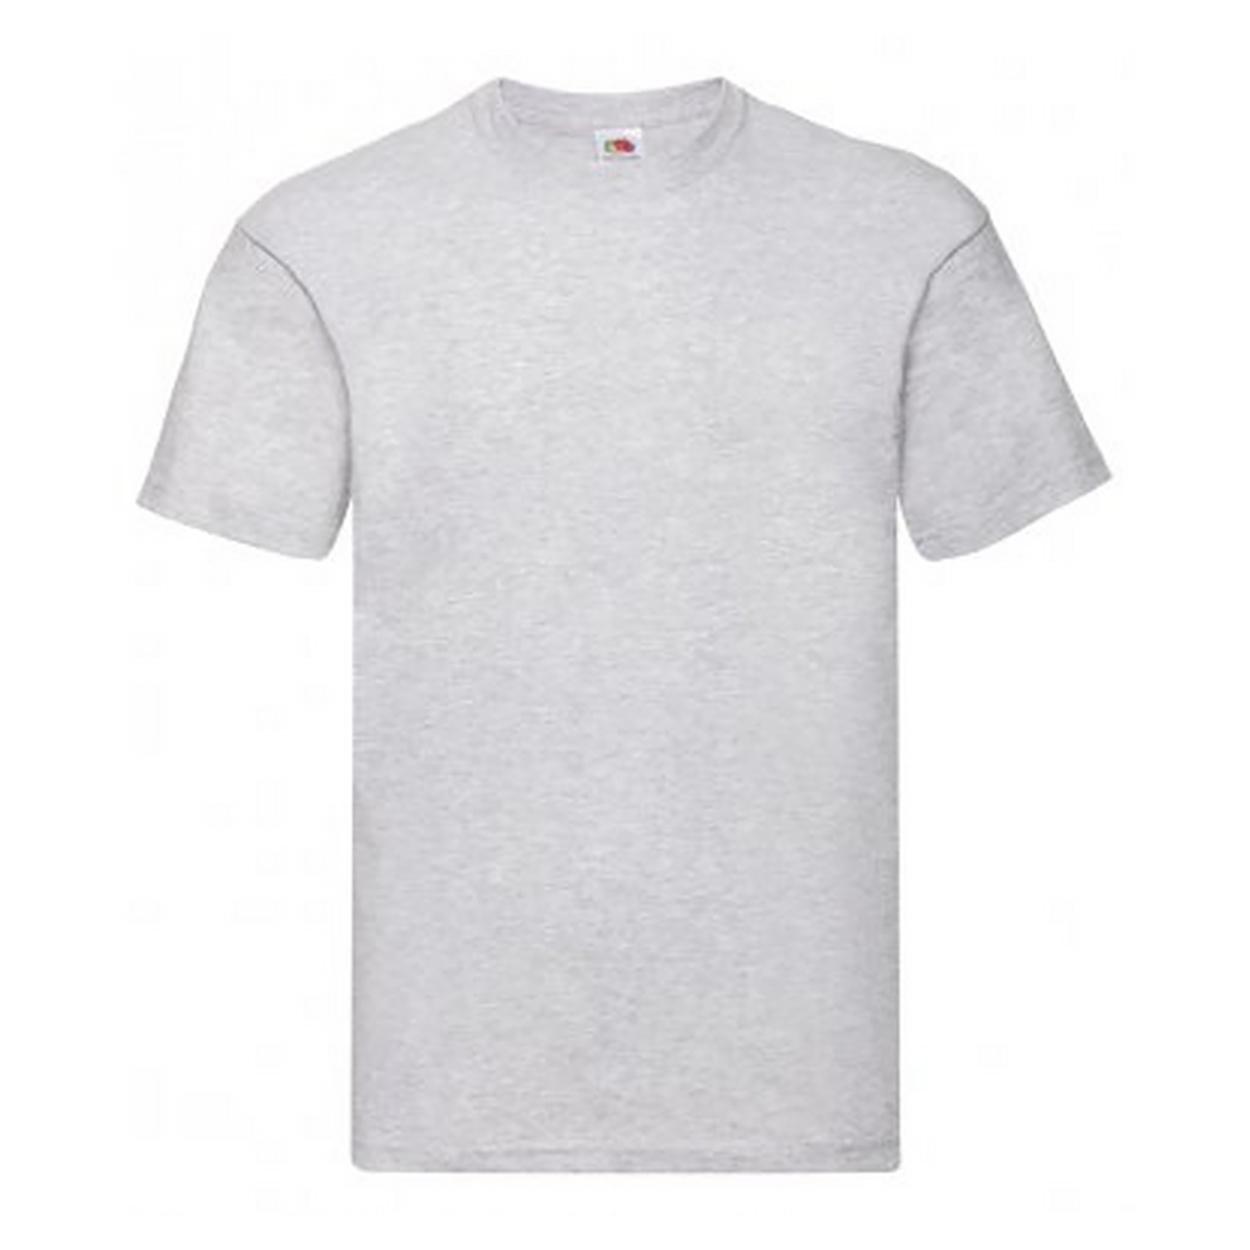 Fruit Of The Loom Mens Original Short Sleeve T-Shirt (L) (Heather)